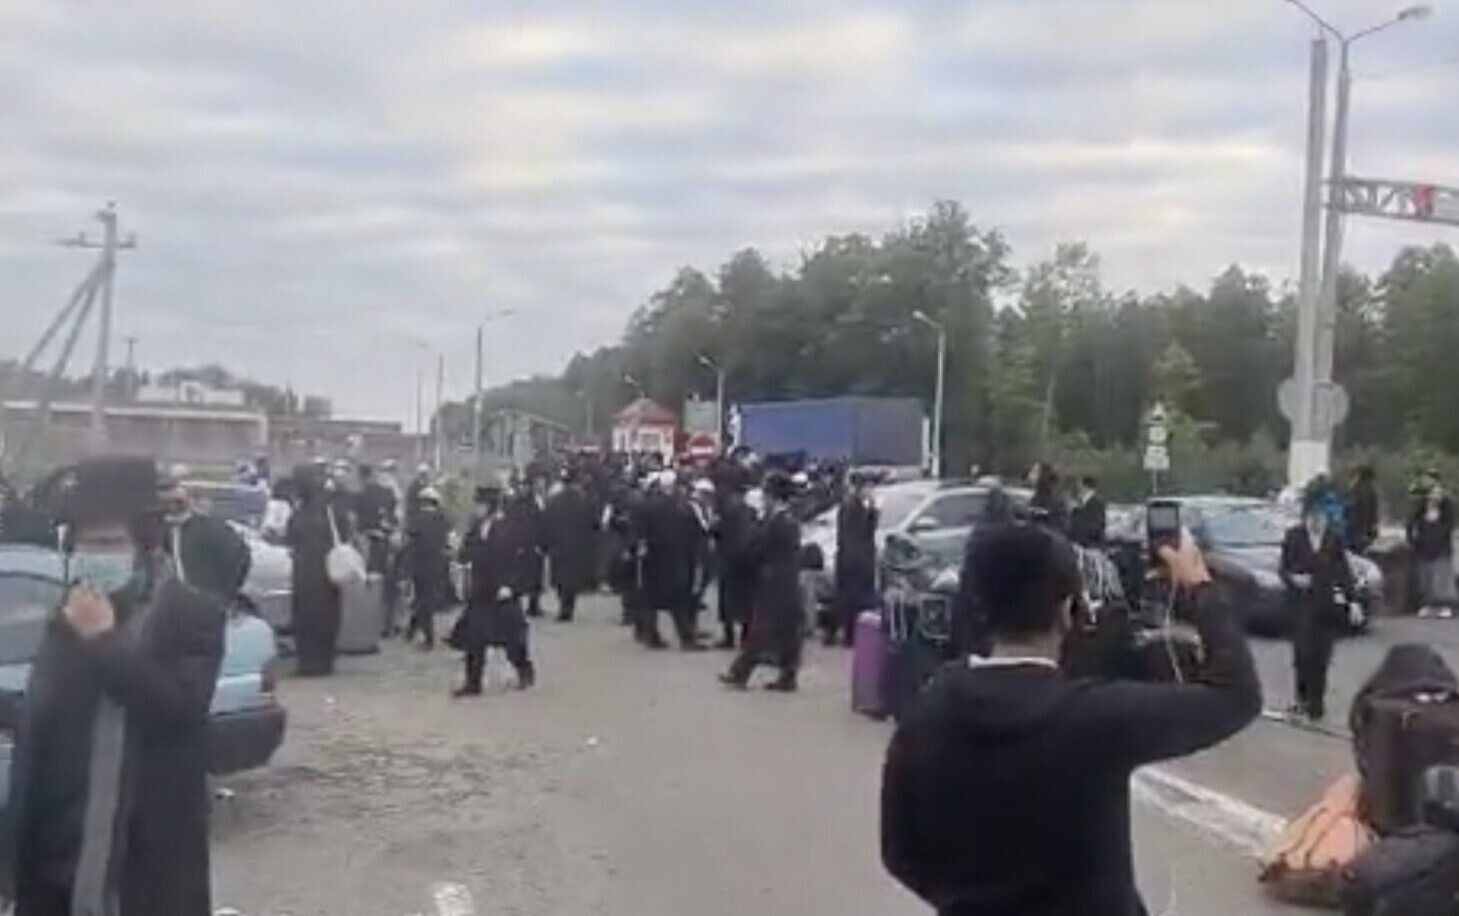 Jewish New Year pilgrims spark Ukraine border block